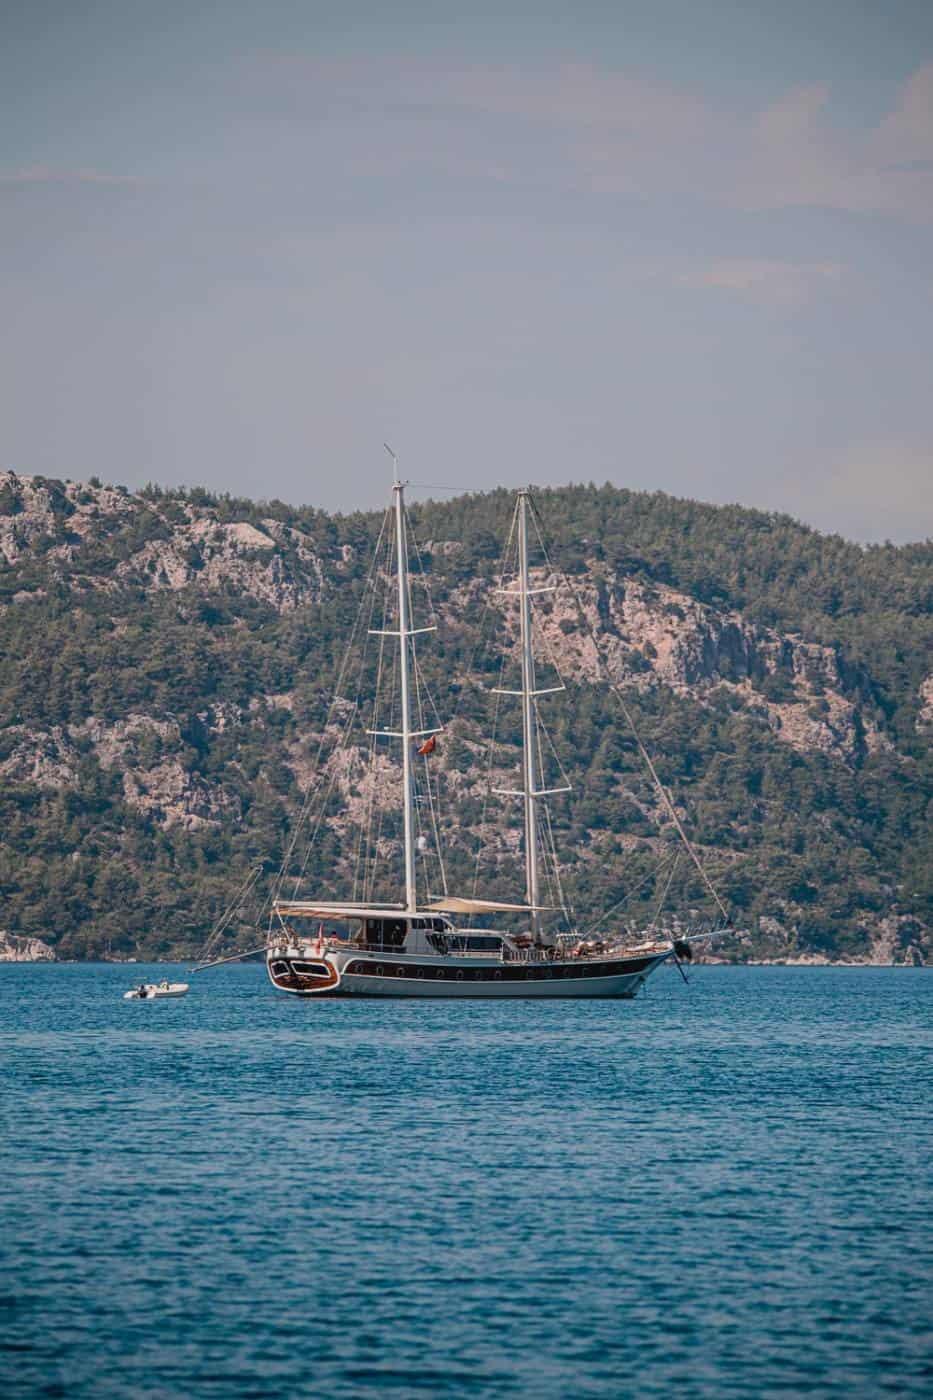 Boat in Marmaris Turkey